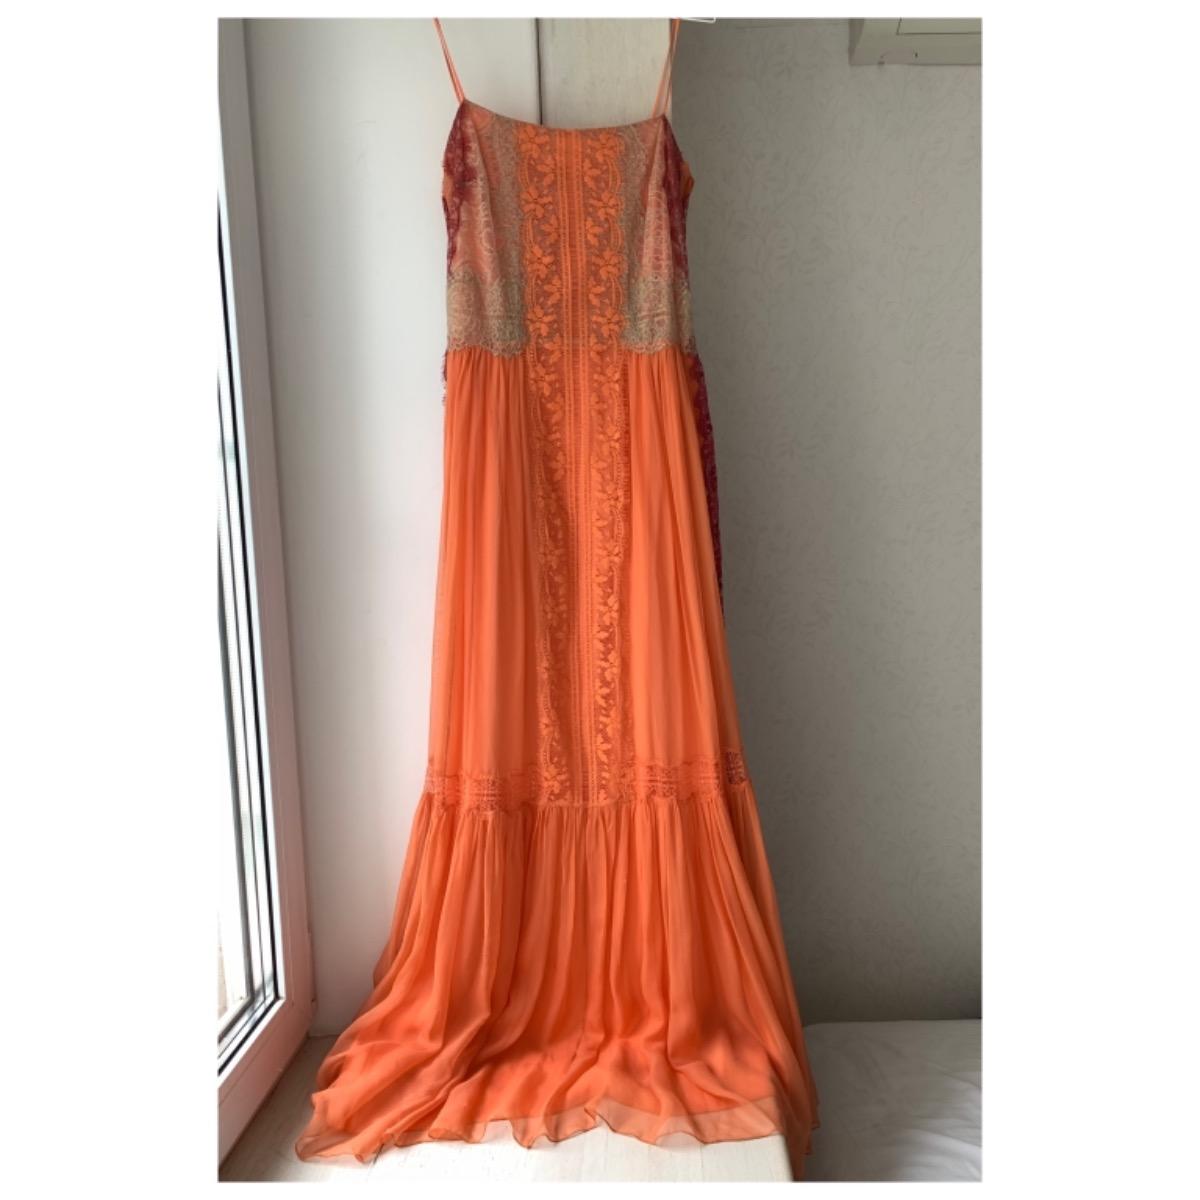 a89ebf73e3e Купить платье Alberta Ferretti за 24000 руб. в интернет магазине ...